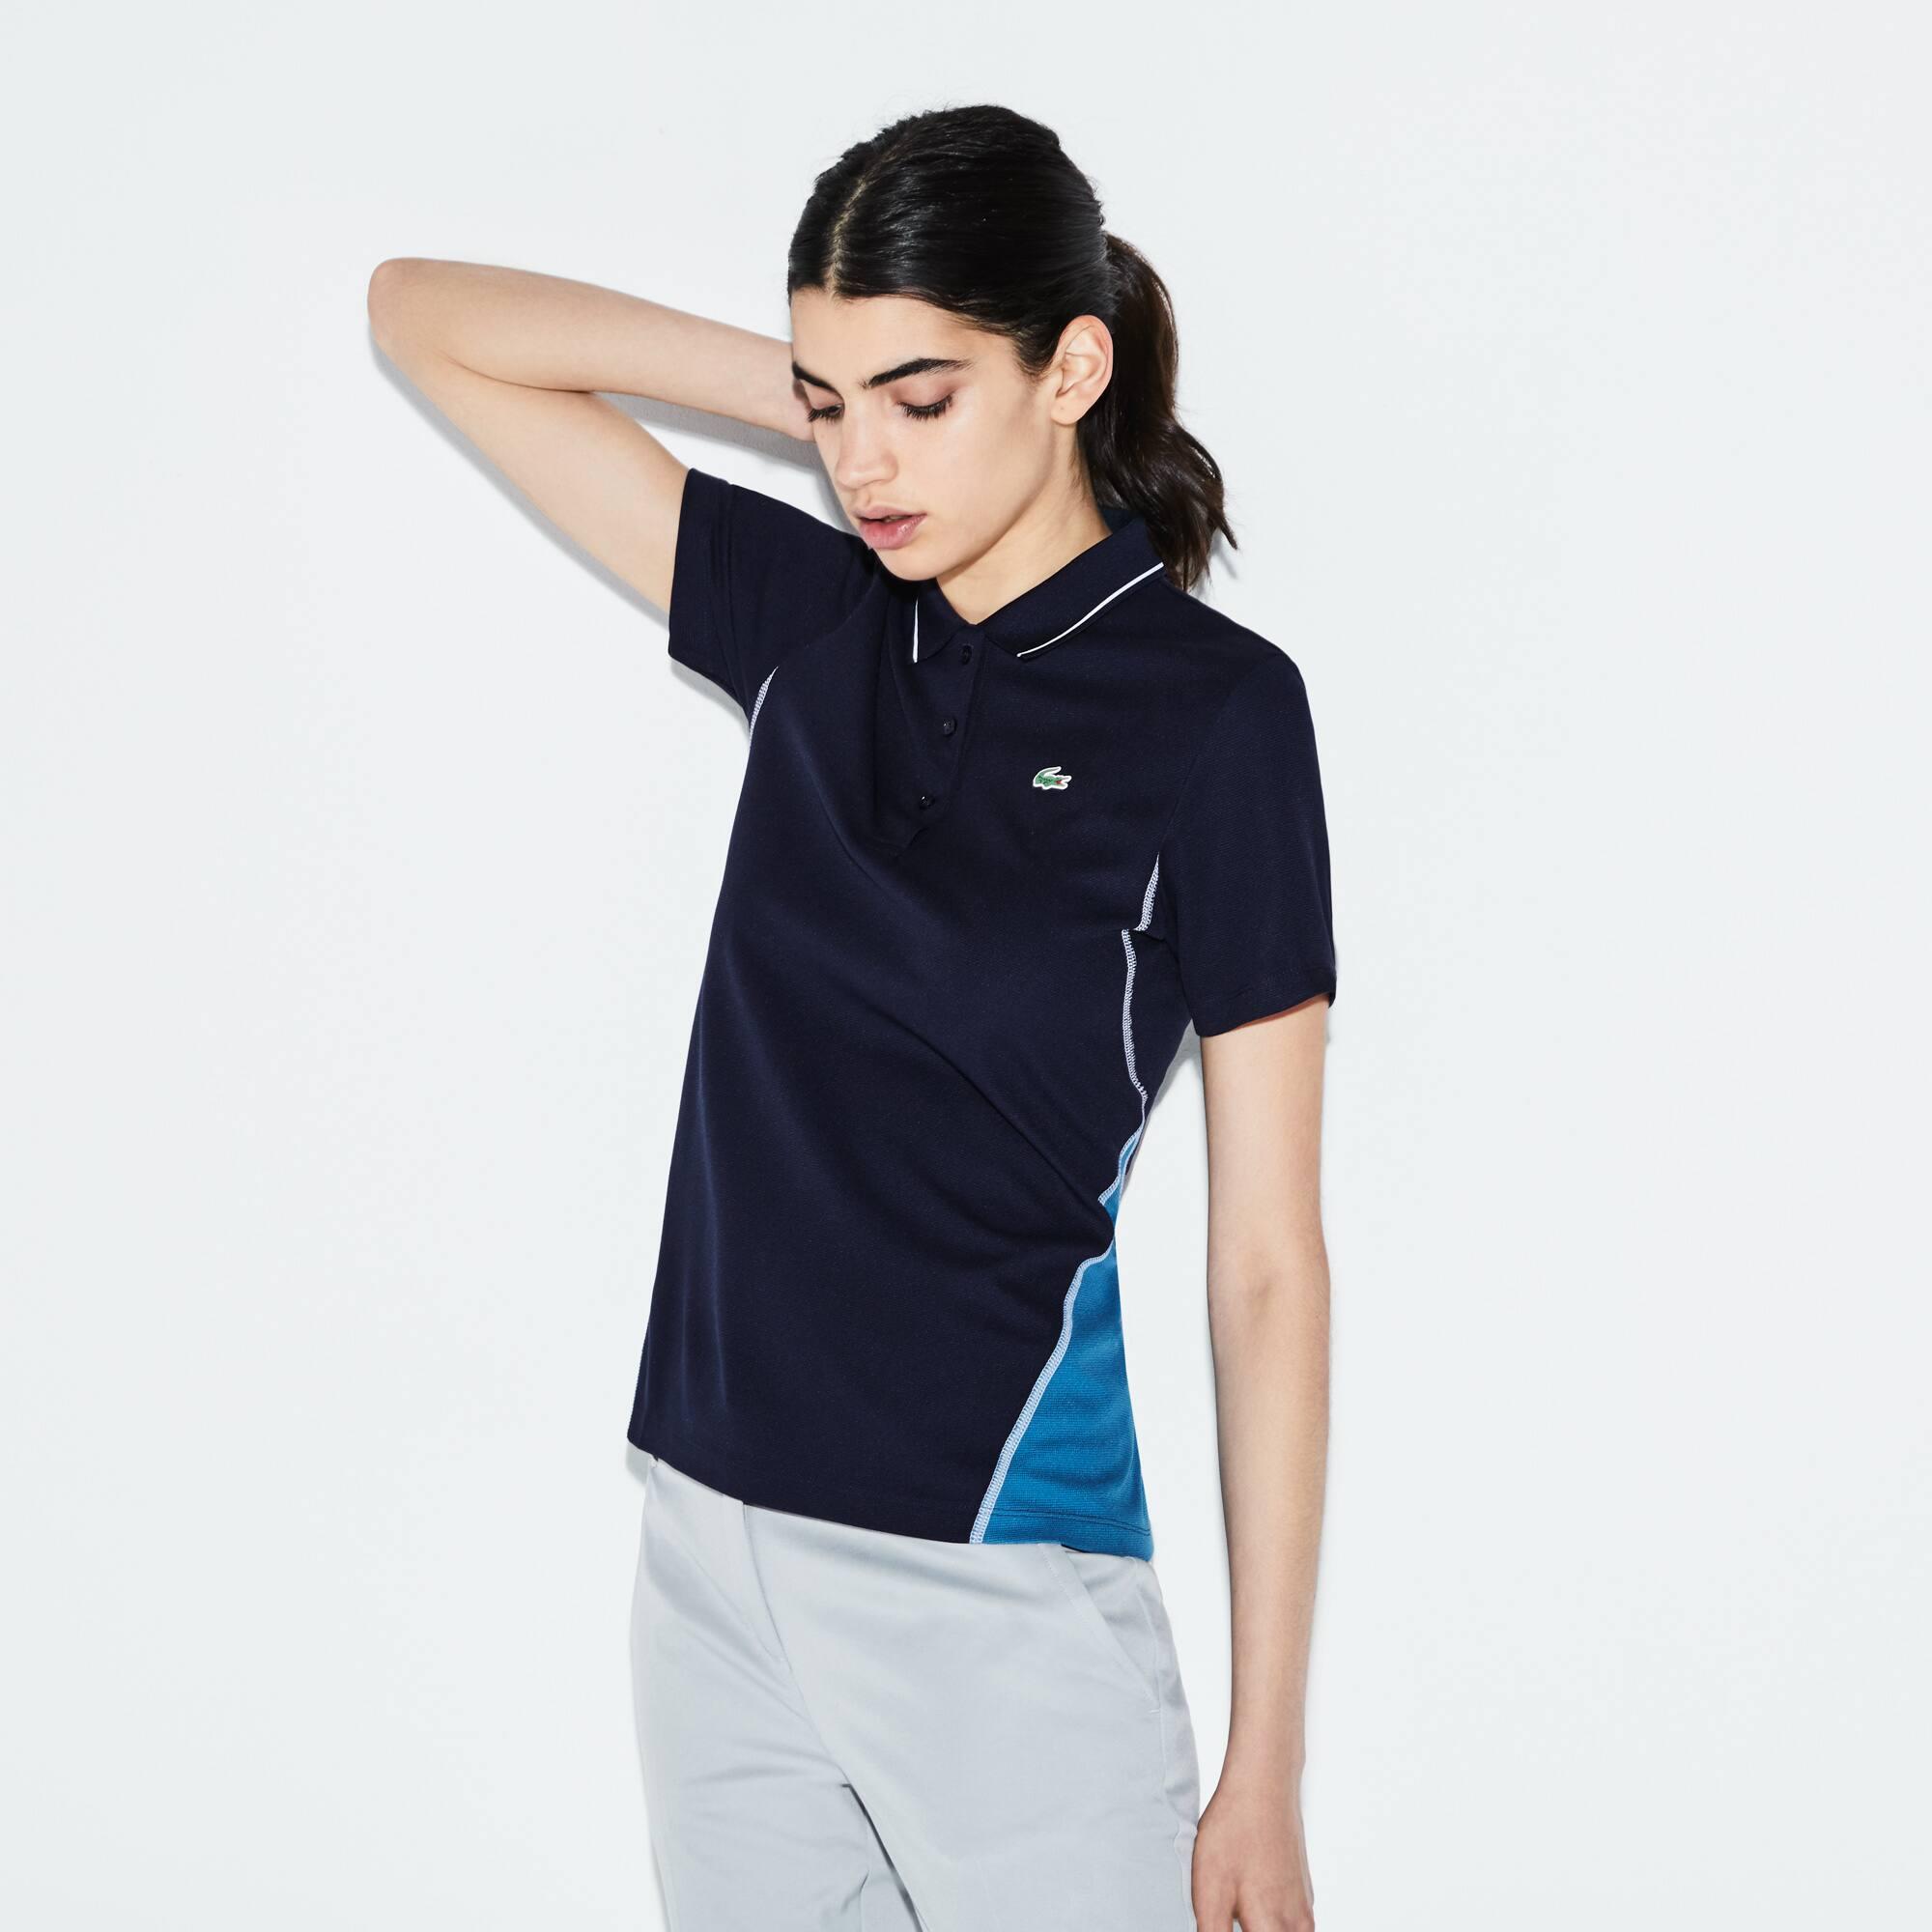 Lacoste SPORT Golf-polo dames technisch katoenbreiwerk